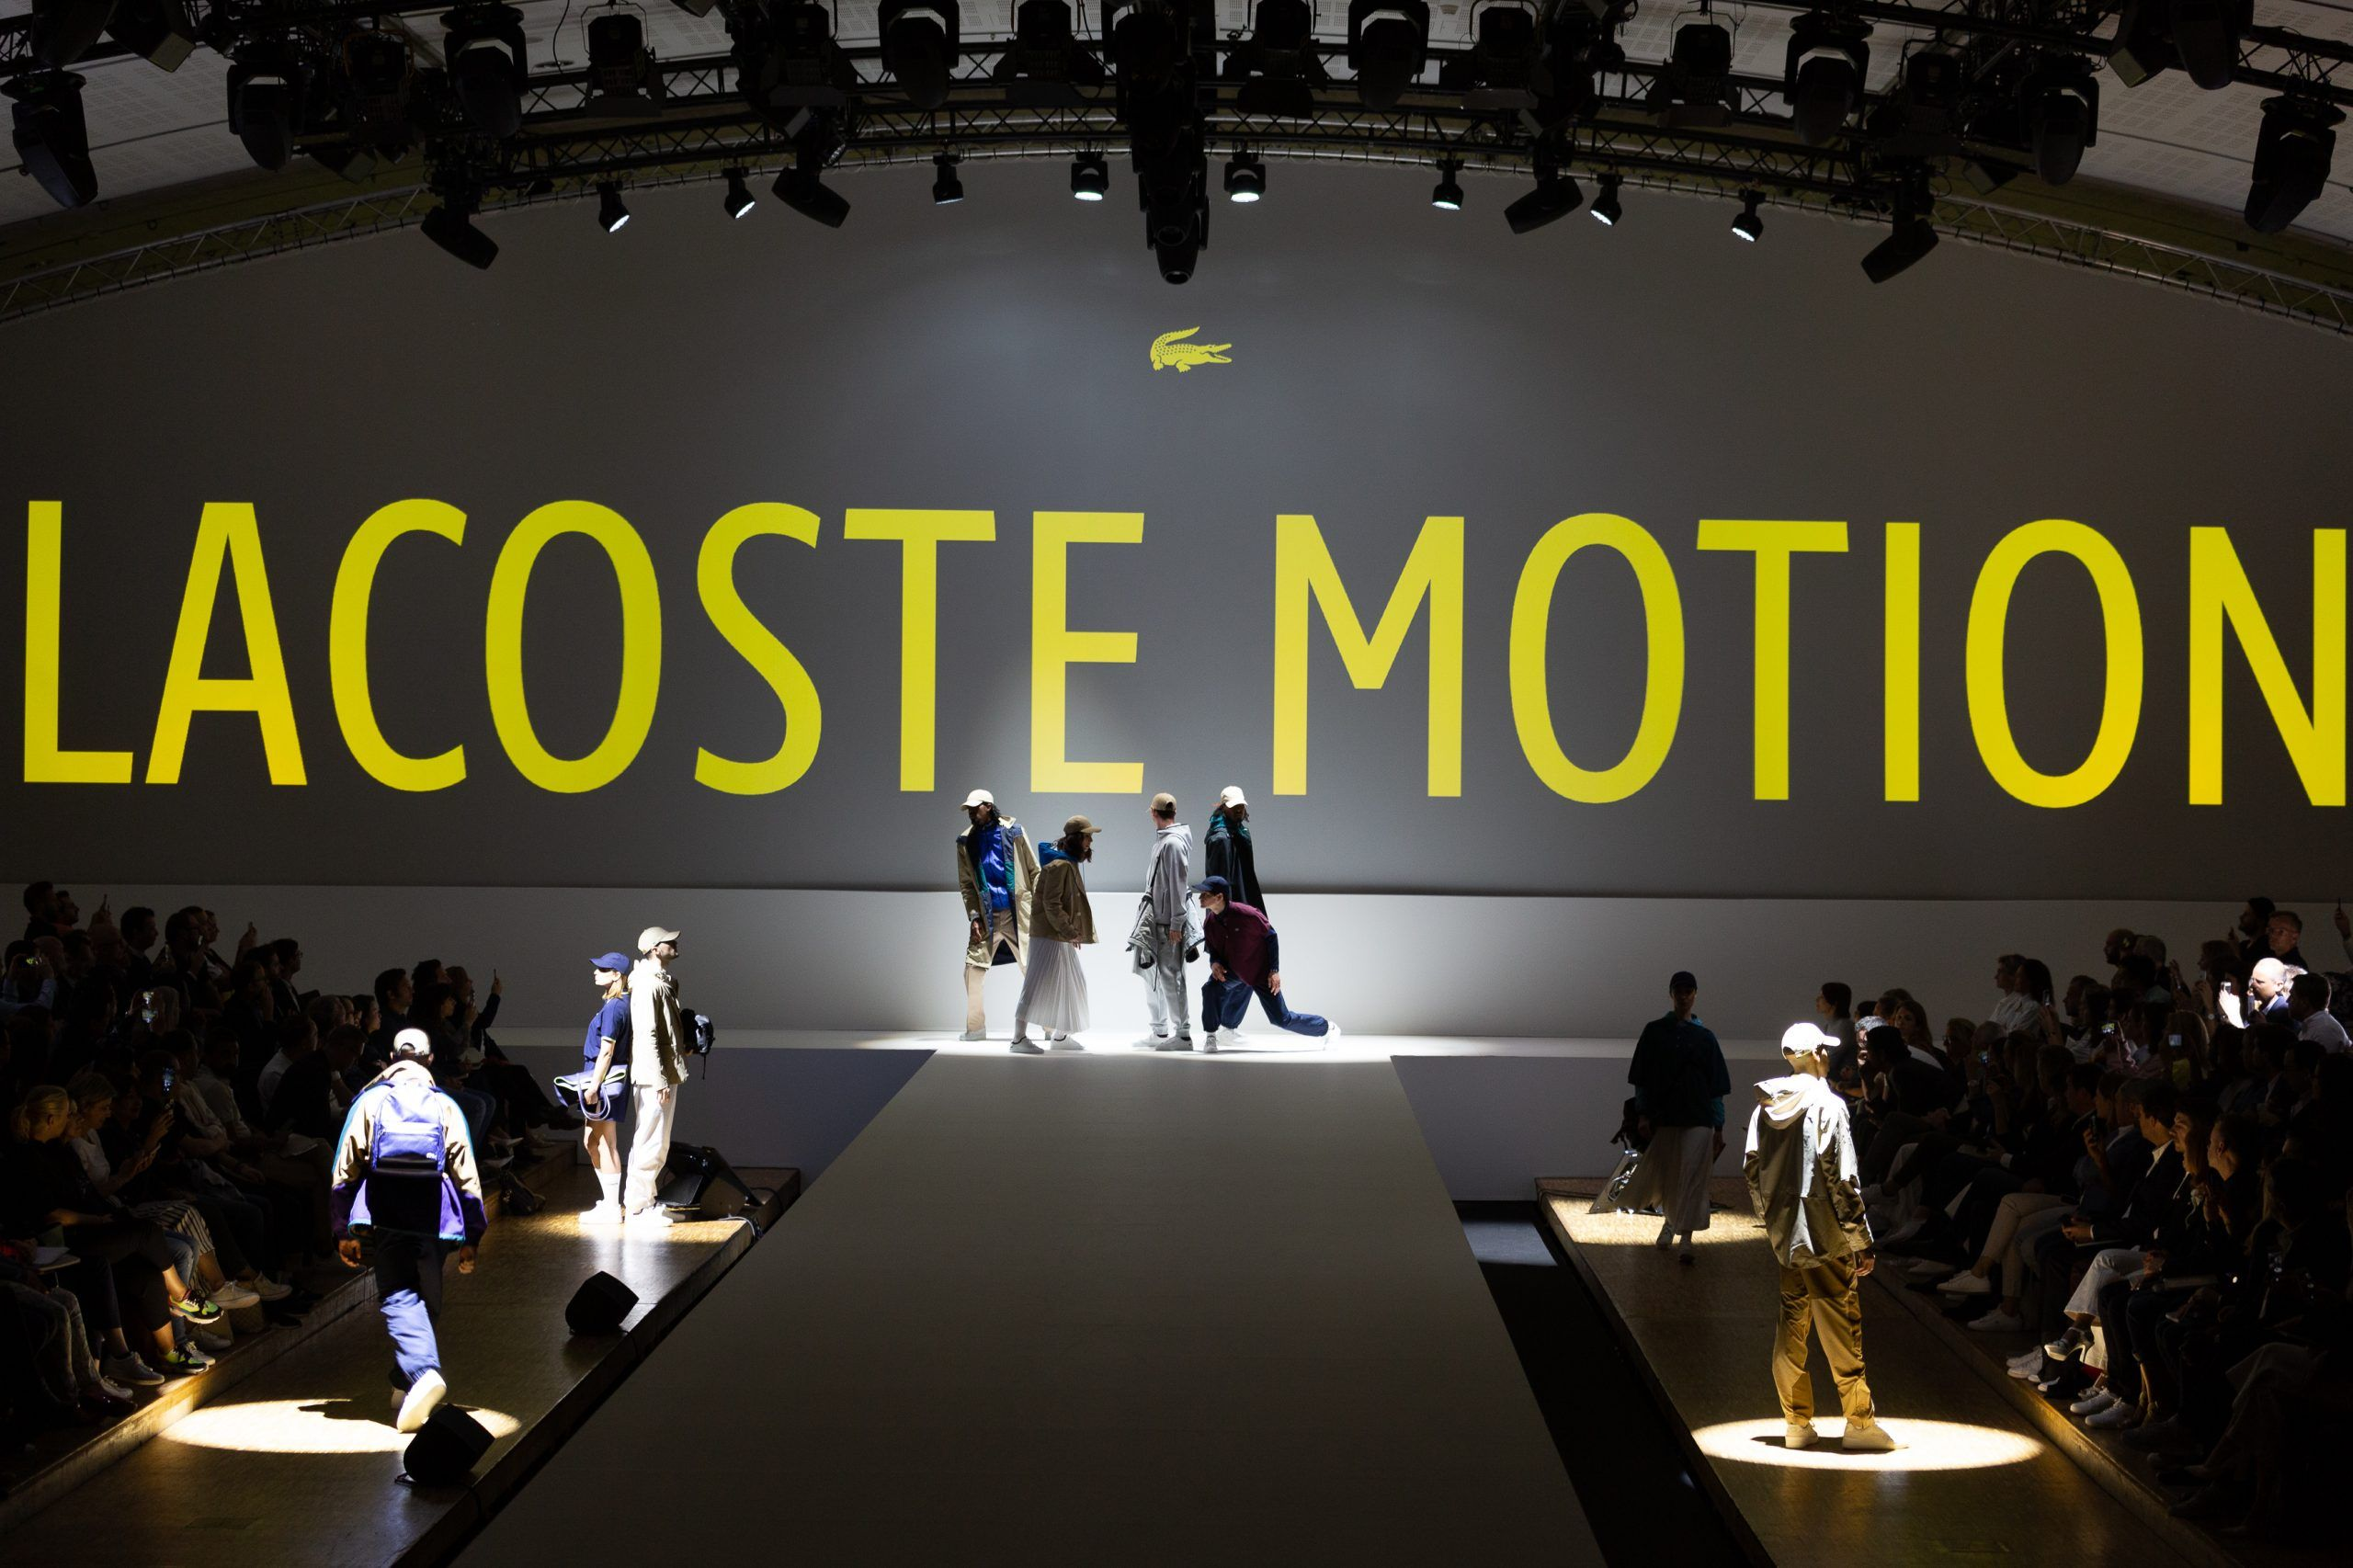 Case Study: Lacoste